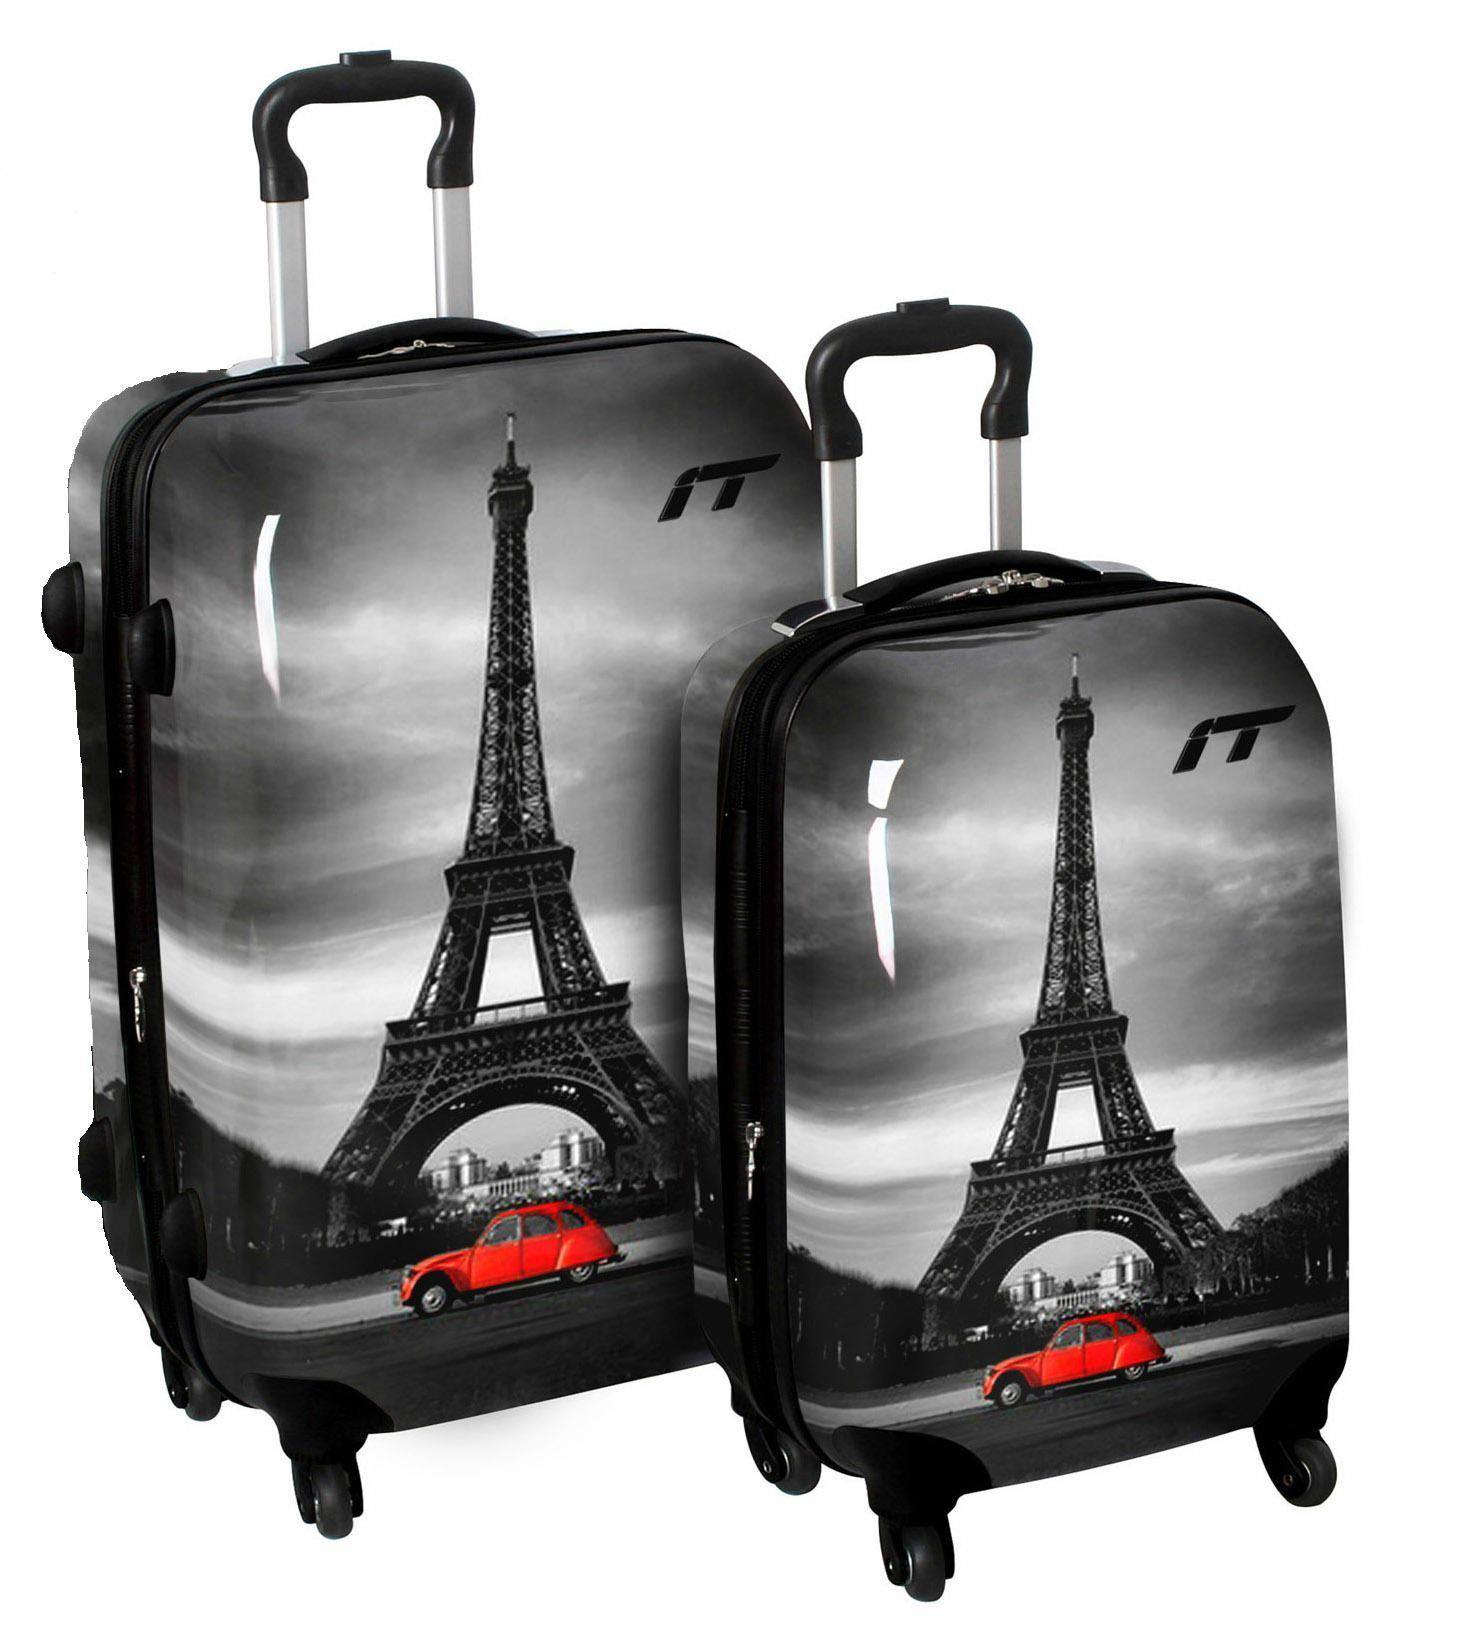 149dcc26a International Traveller Shiny Classic Paris 4-Wheeled 2 Piece Luggage Set  81141/2-PARIS - Luggage Pros